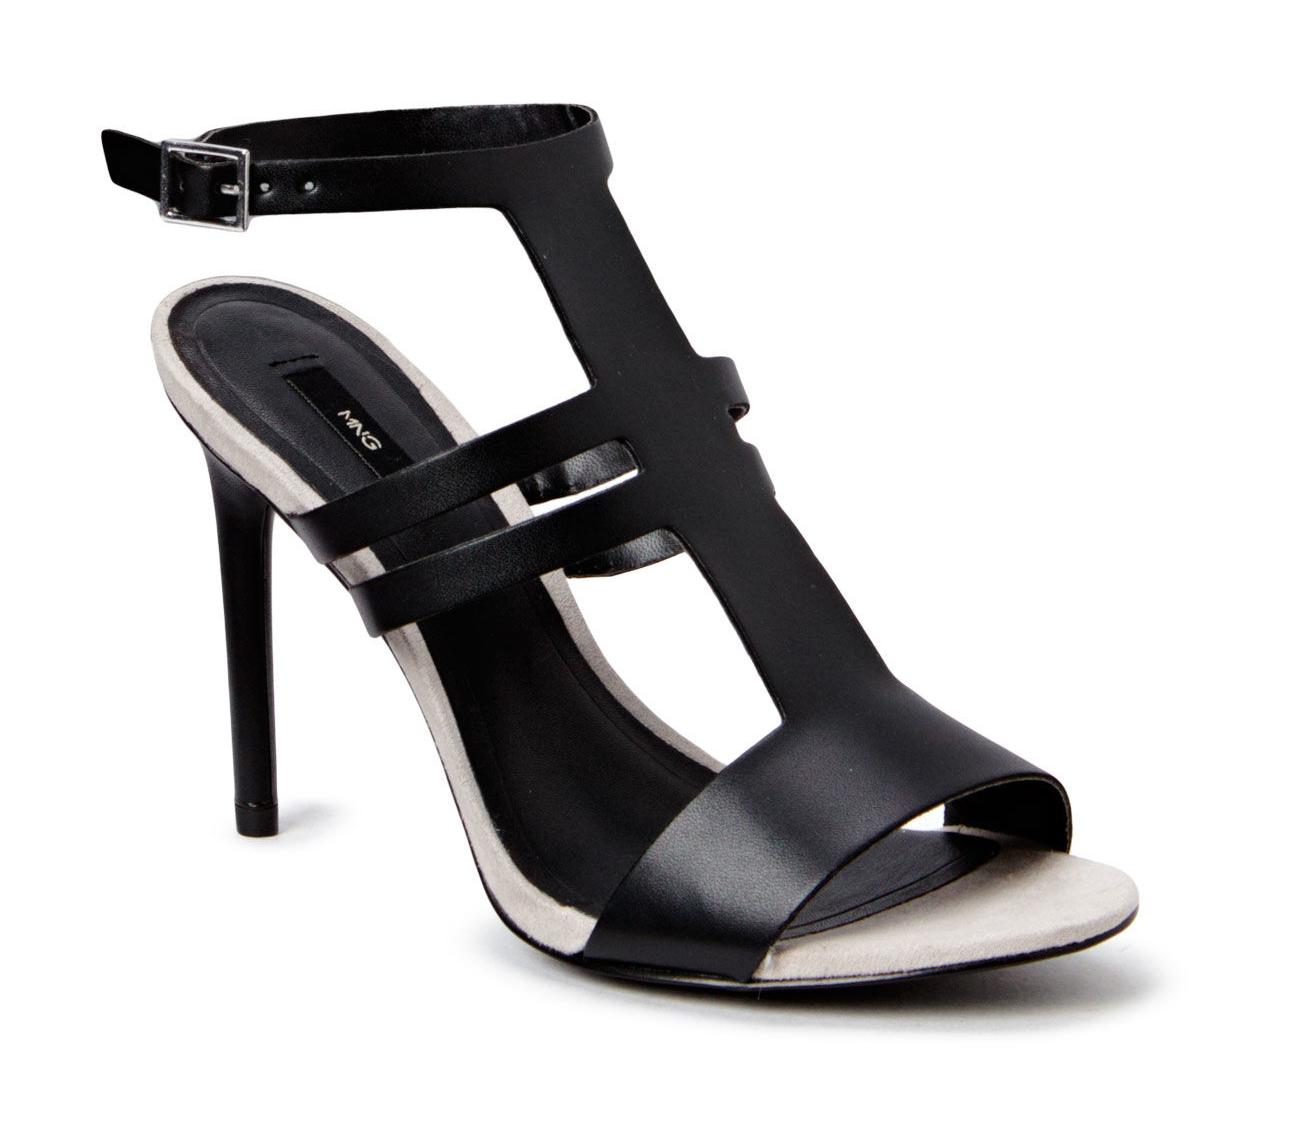 Mango T-bar sandals Farve: Sort Pris: 299,-